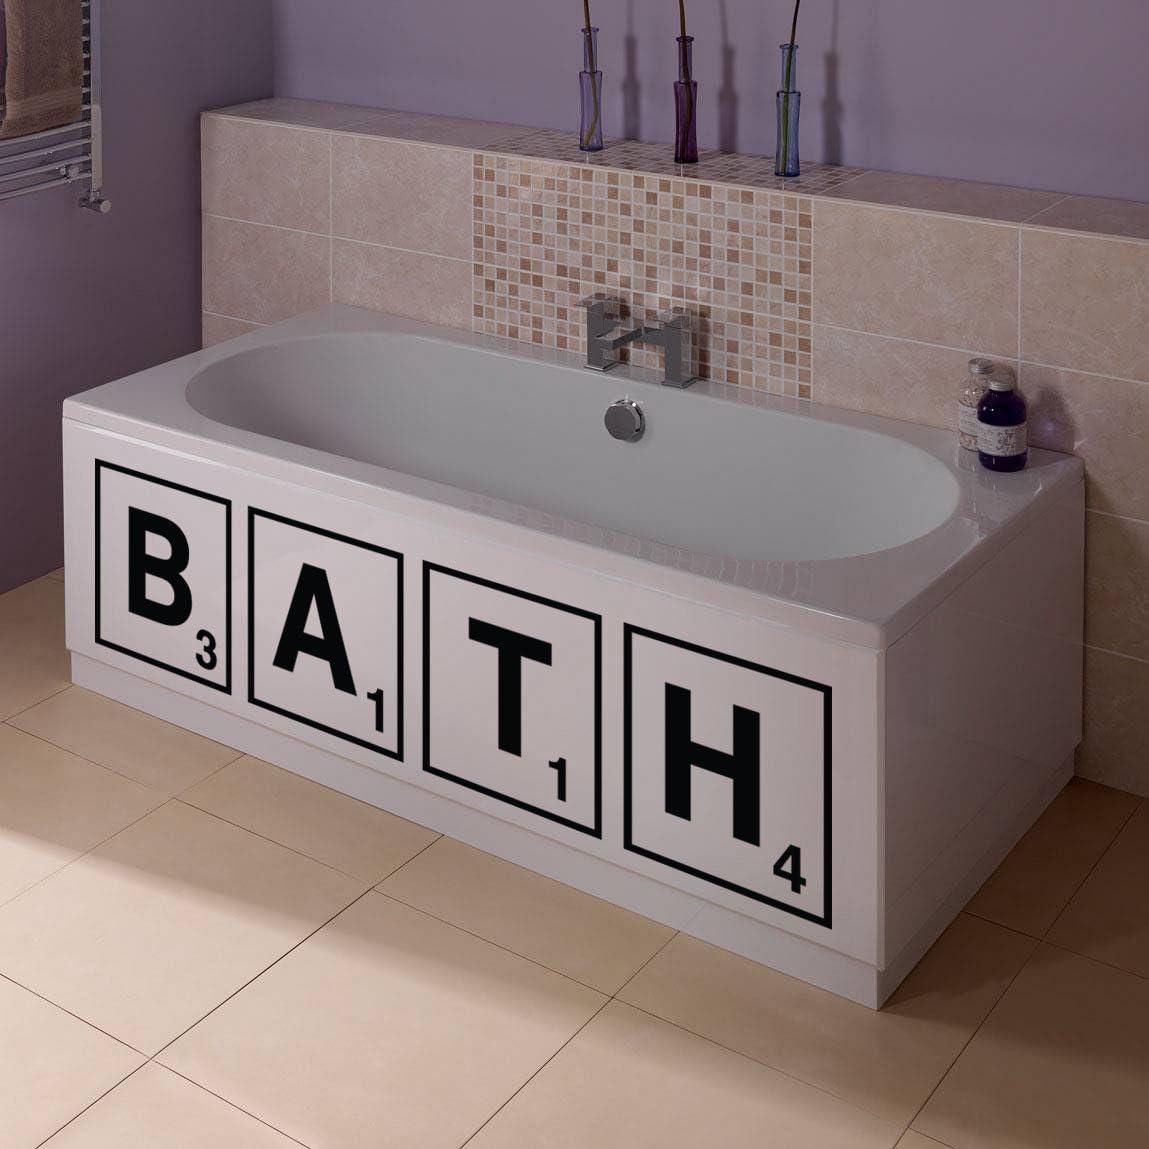 Bath Panel Scrabble Sticker Amazon Co Uk Diy Tools